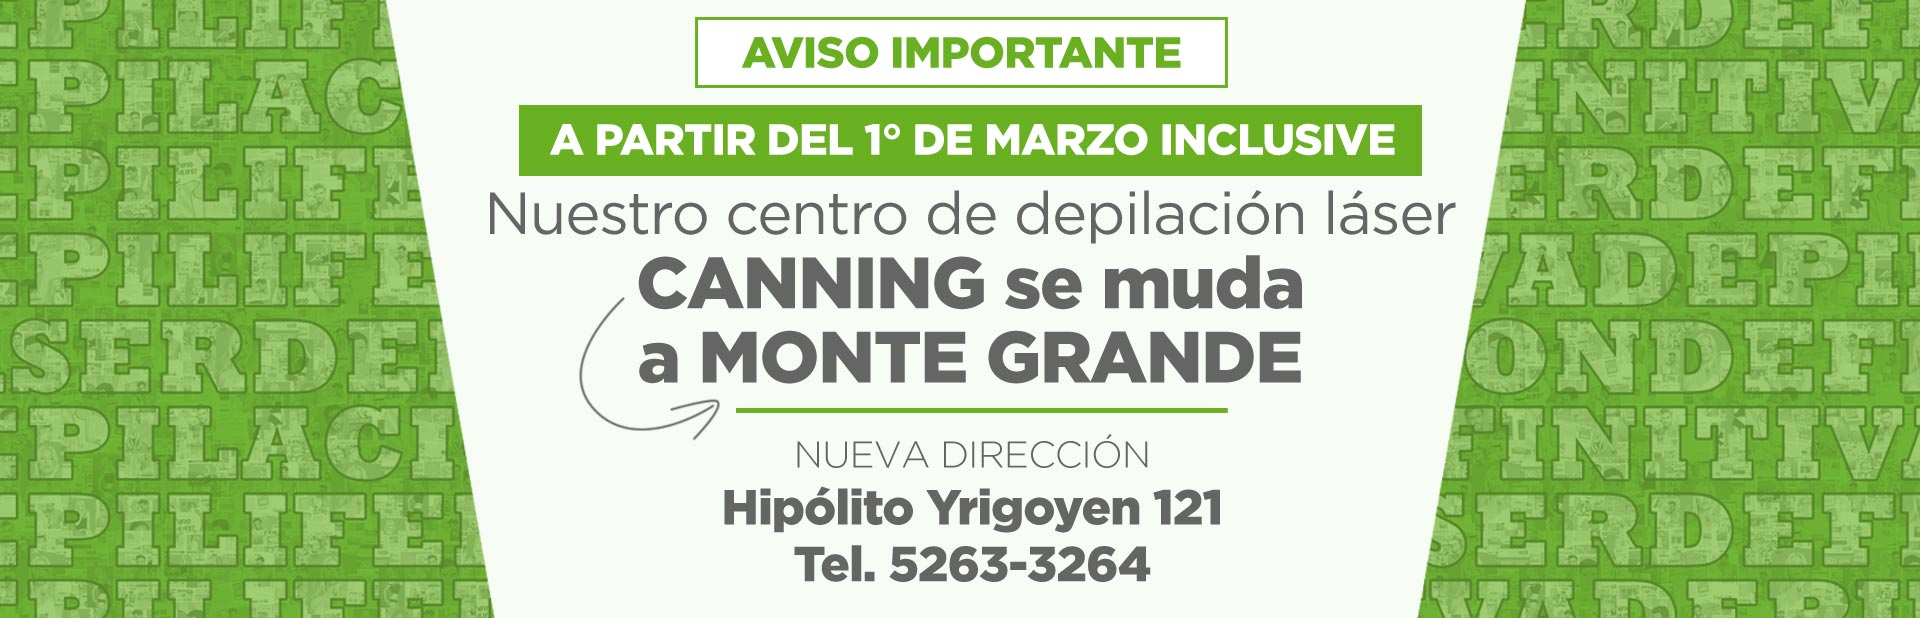 DepiLife Montegrande!